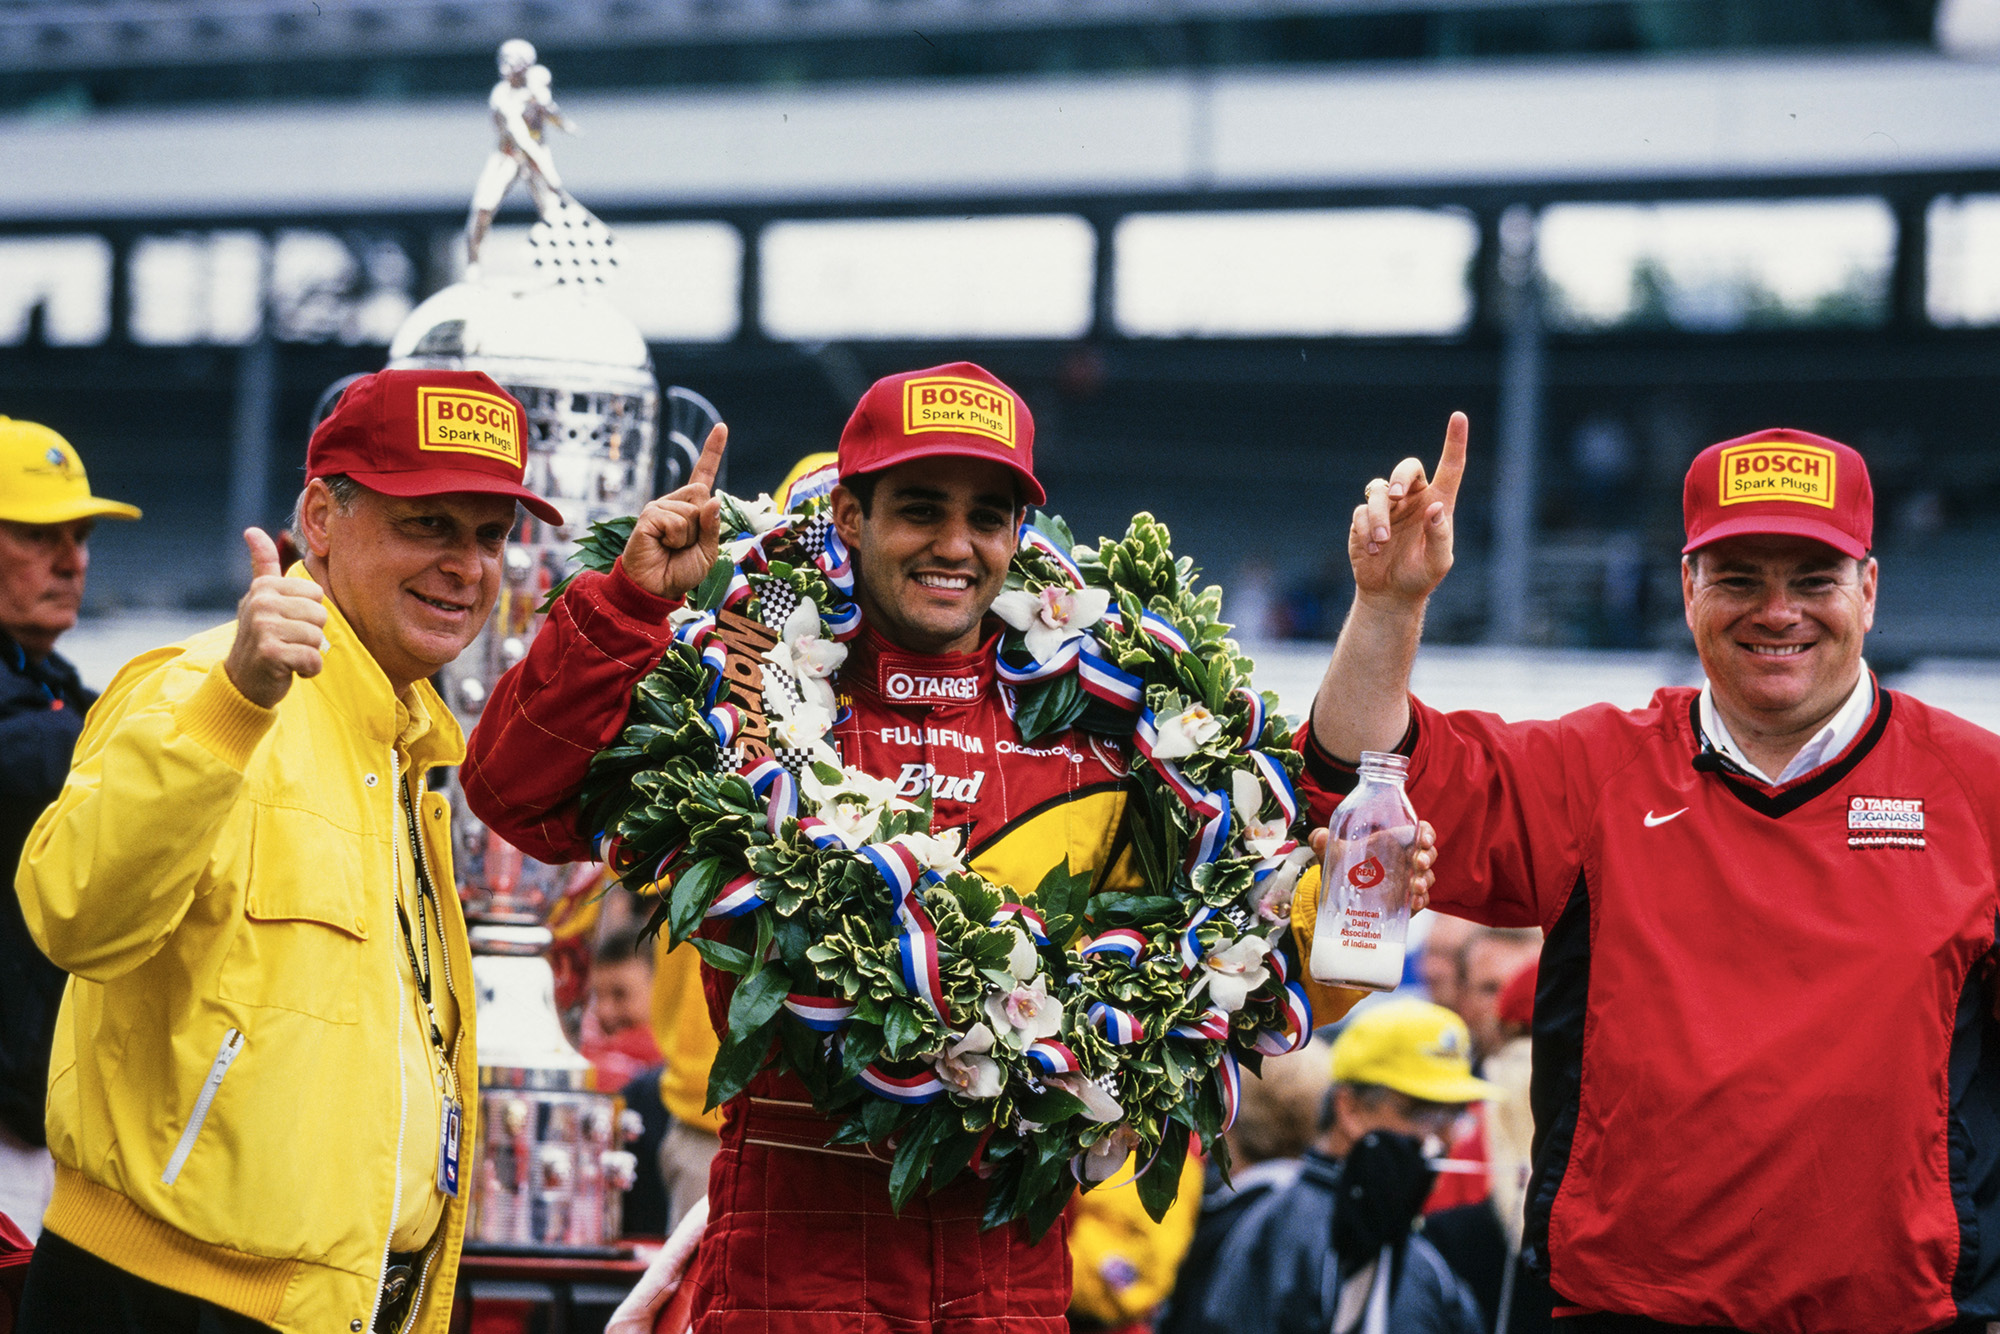 Juan Pablo Montoya celebrating victory in the 2000 Indy 500